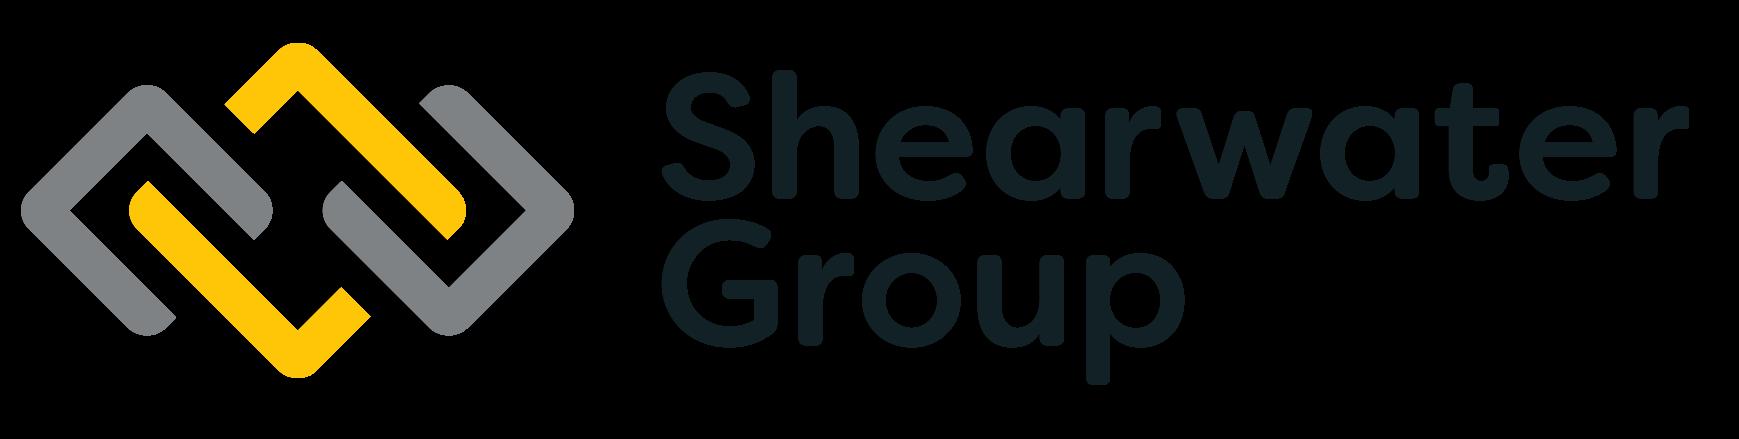 Shearwater Group Logo